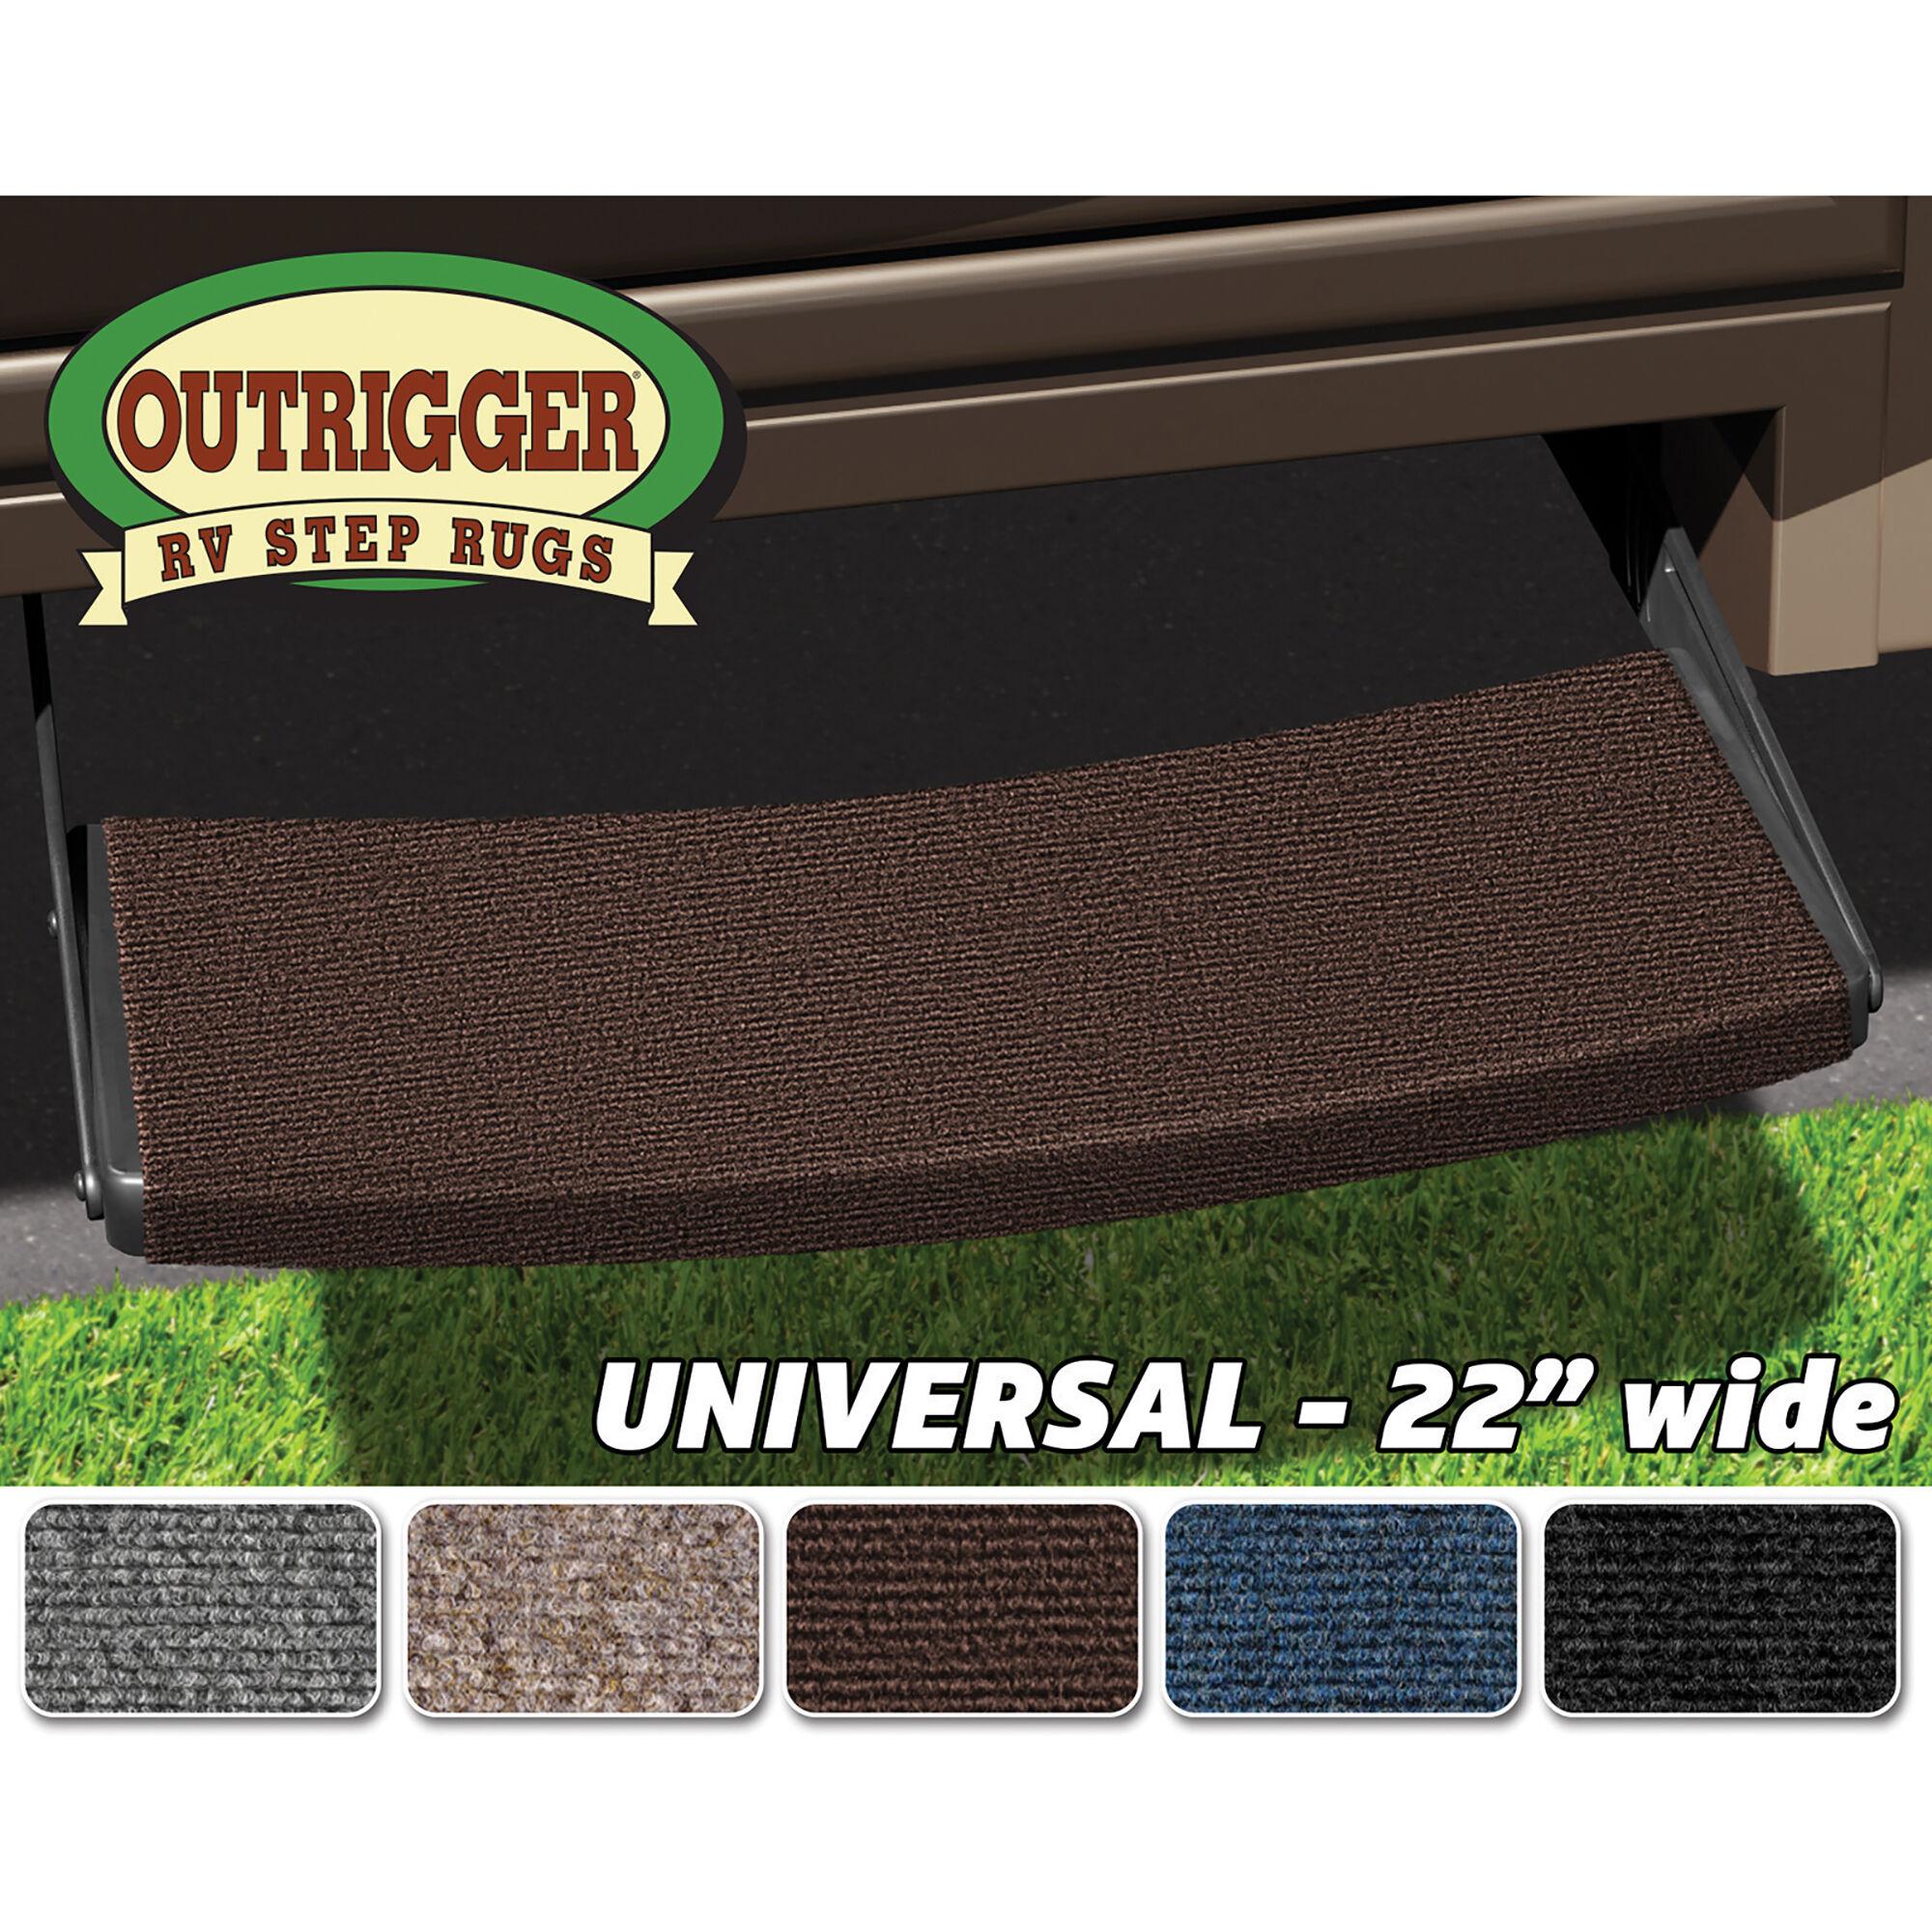 Prest-O-Fit 2-0311 Outrigger Walnut Brown 18 X 17 RV Step Rug